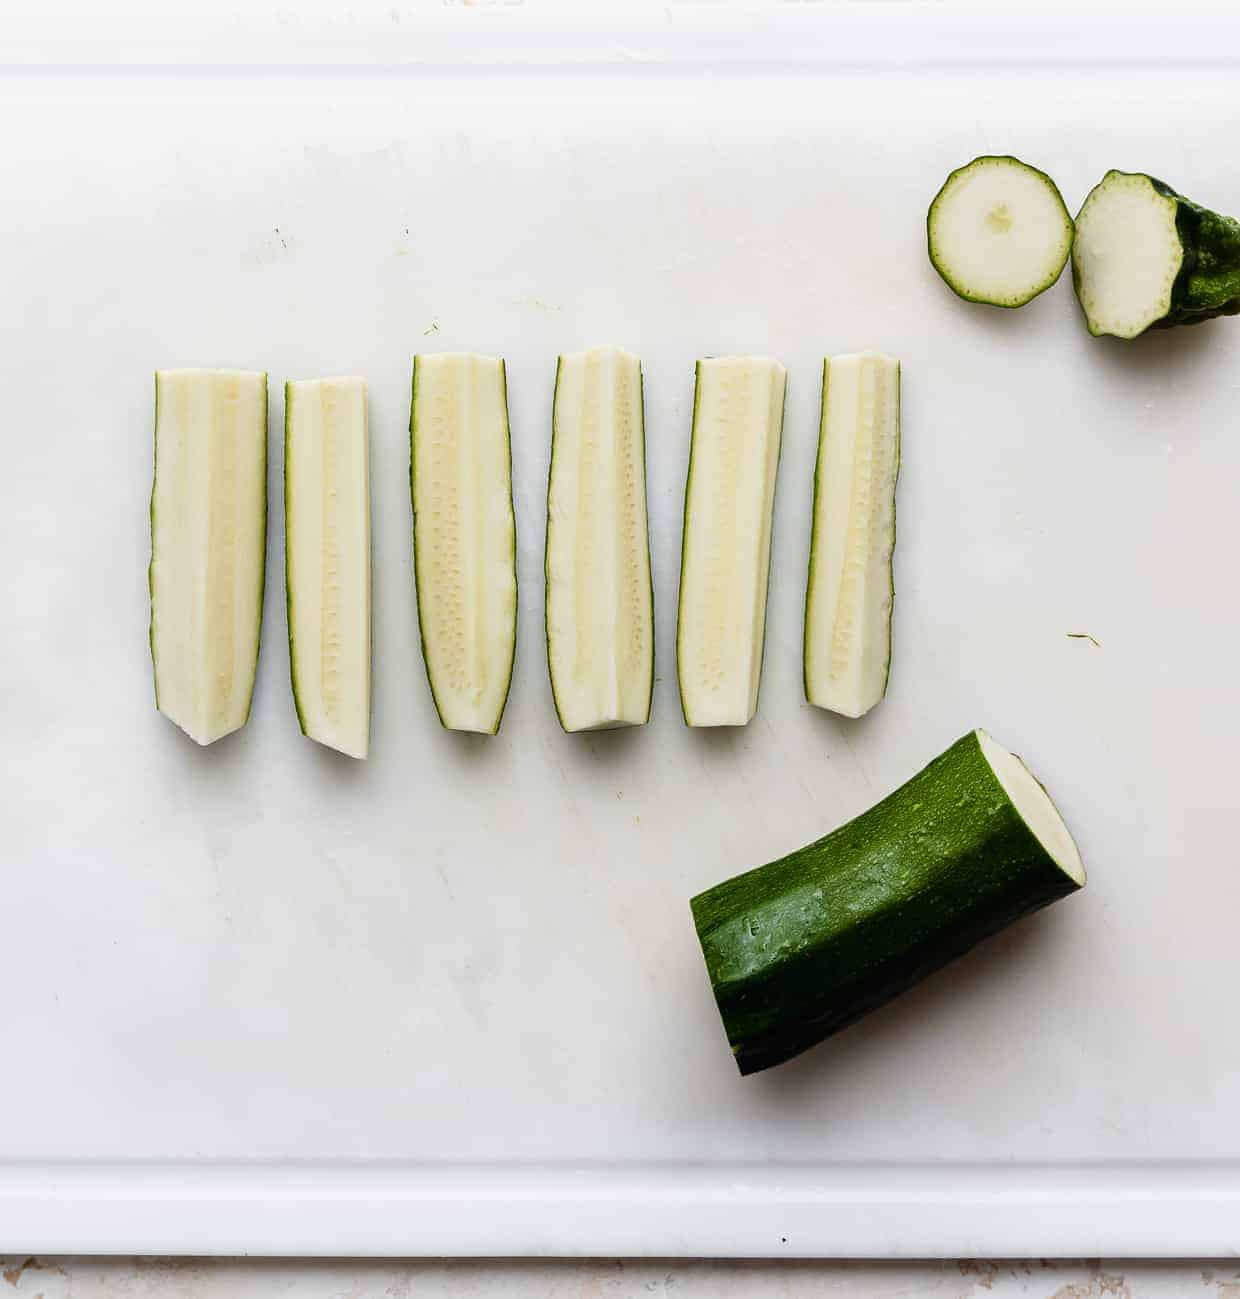 Freshly cut zucchini strips on a white cutting board, to make baked zucchini fries.